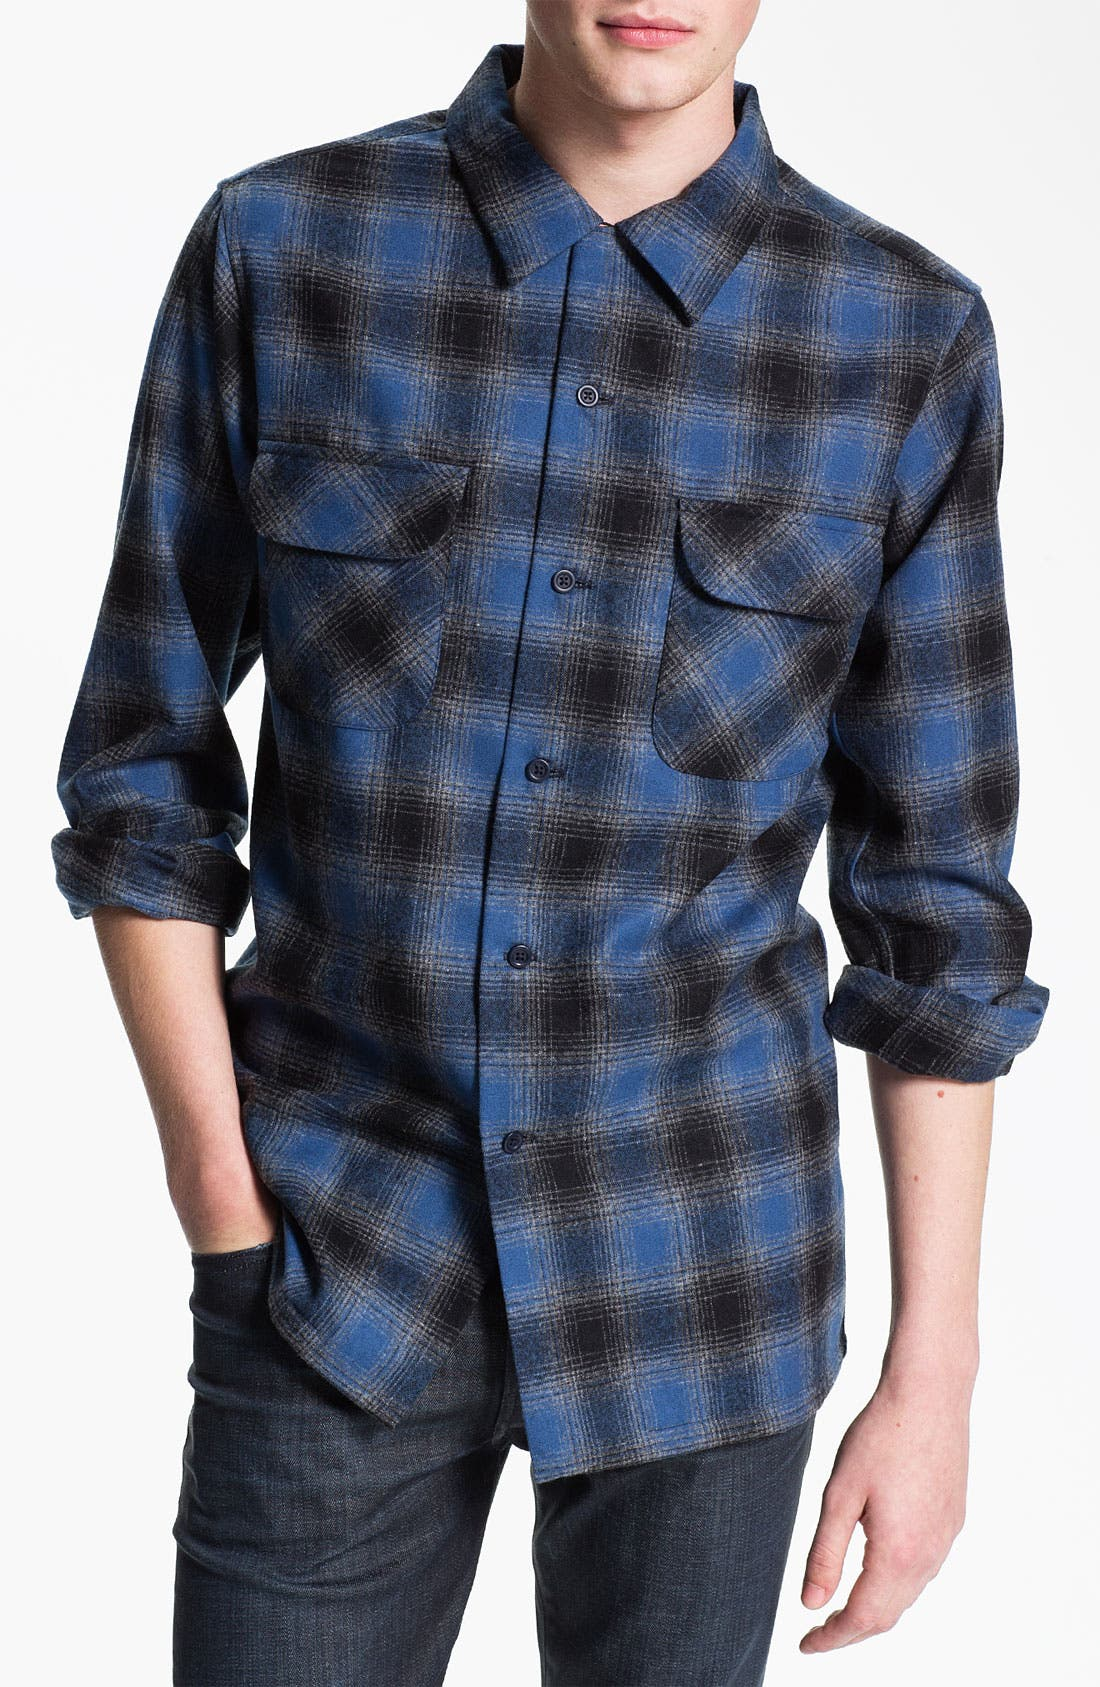 Main Image - Pendleton 'Board' Plaid Flannel Shirt